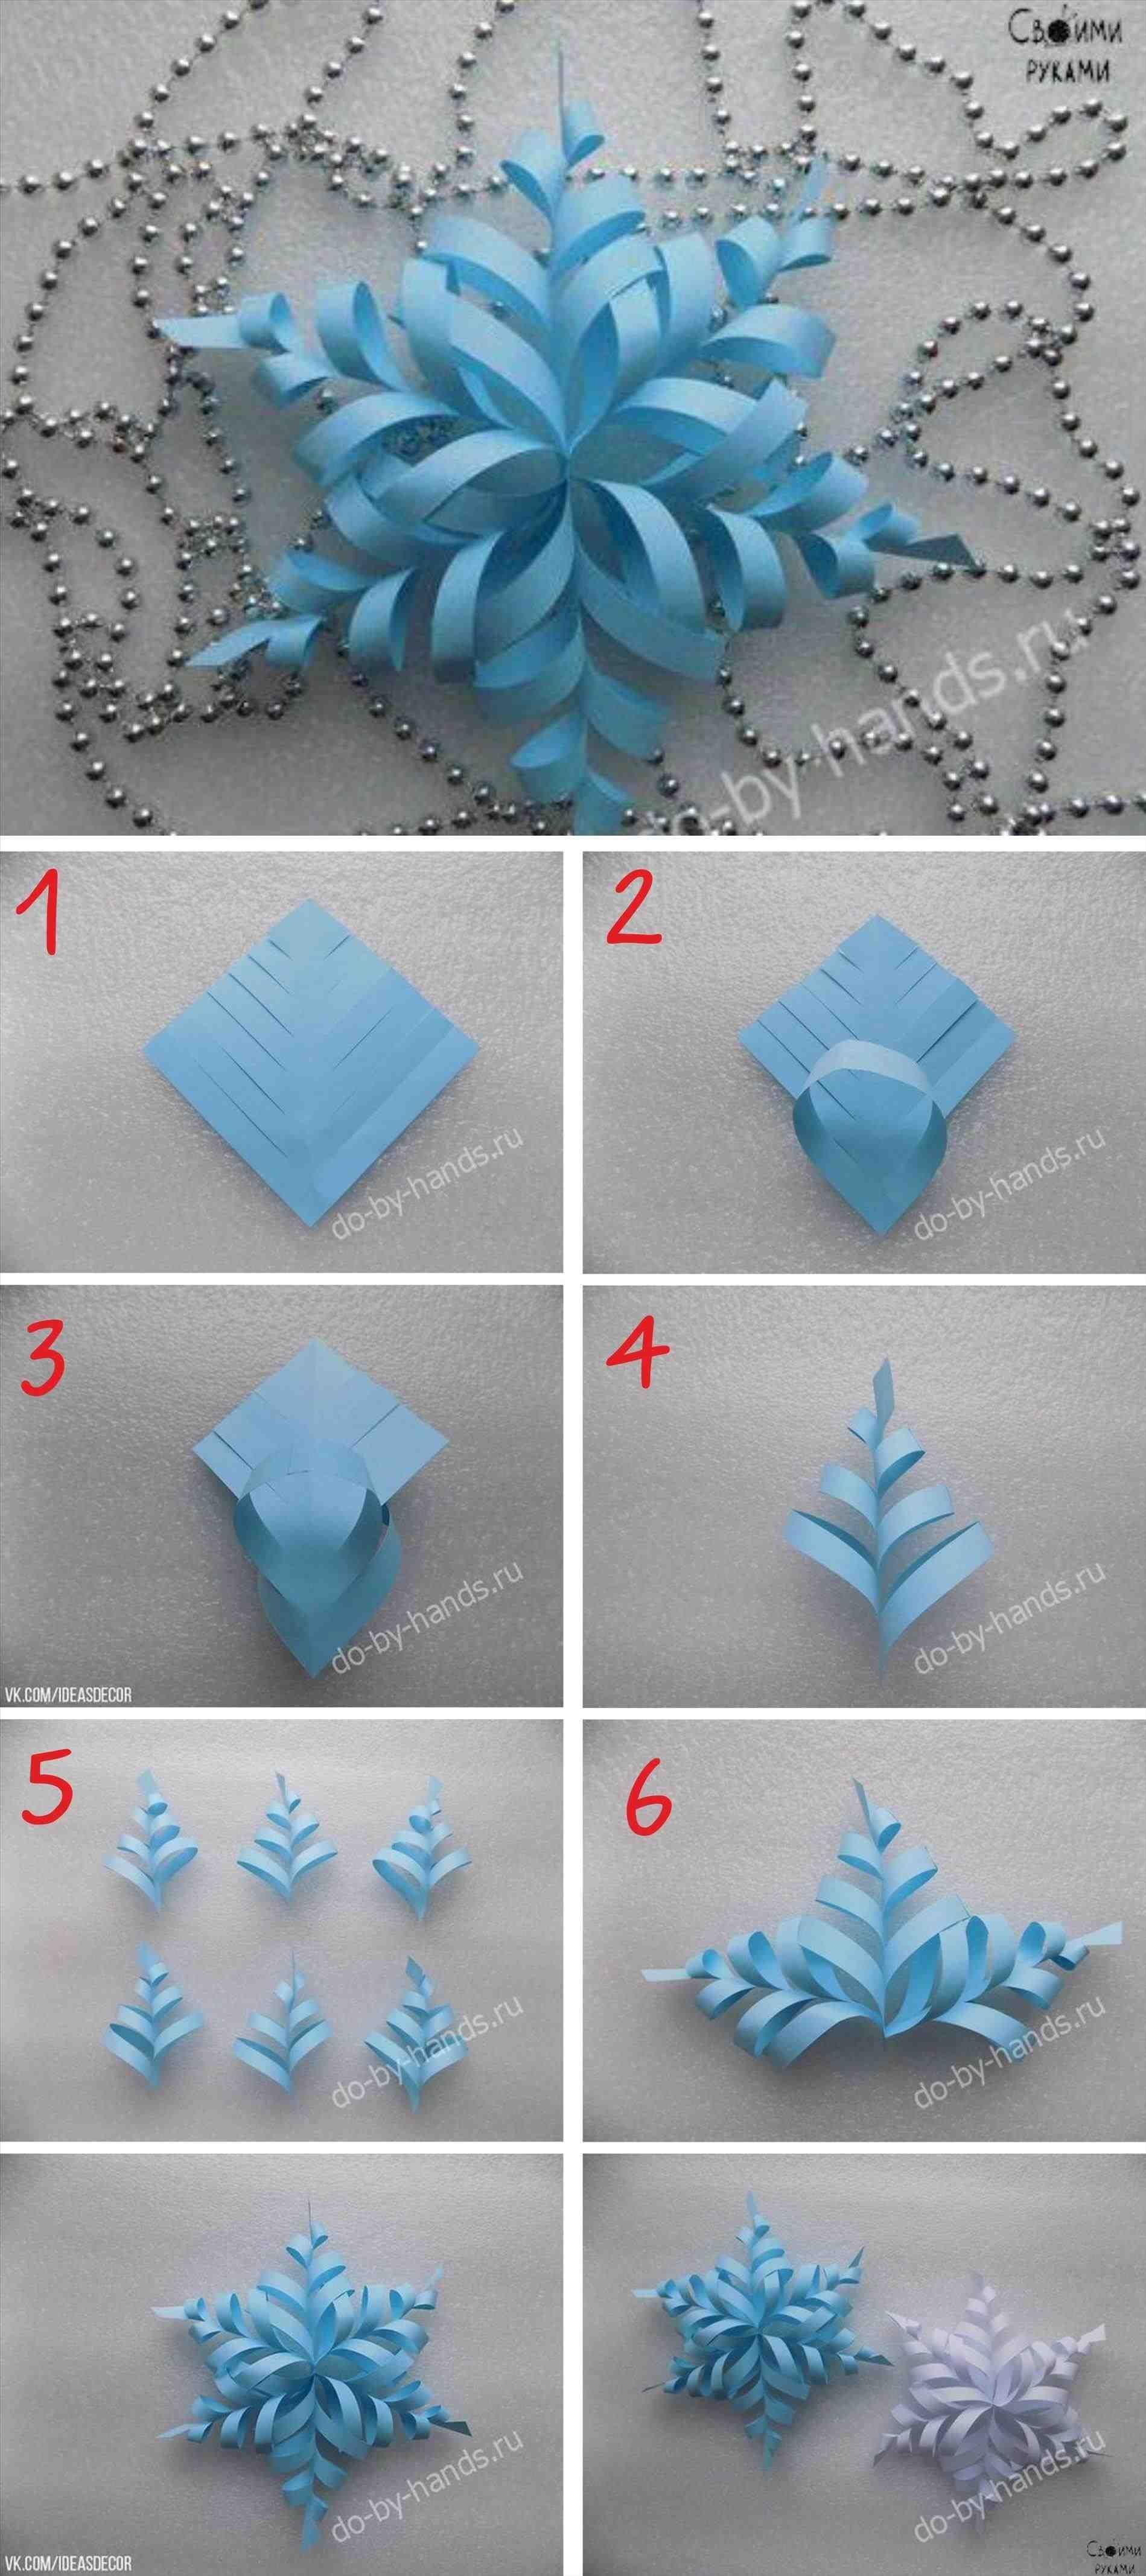 47 Home Decor Ideas With Paper Decor Ideas Paper Paper Crafts Diy Crafts Paper Crafts